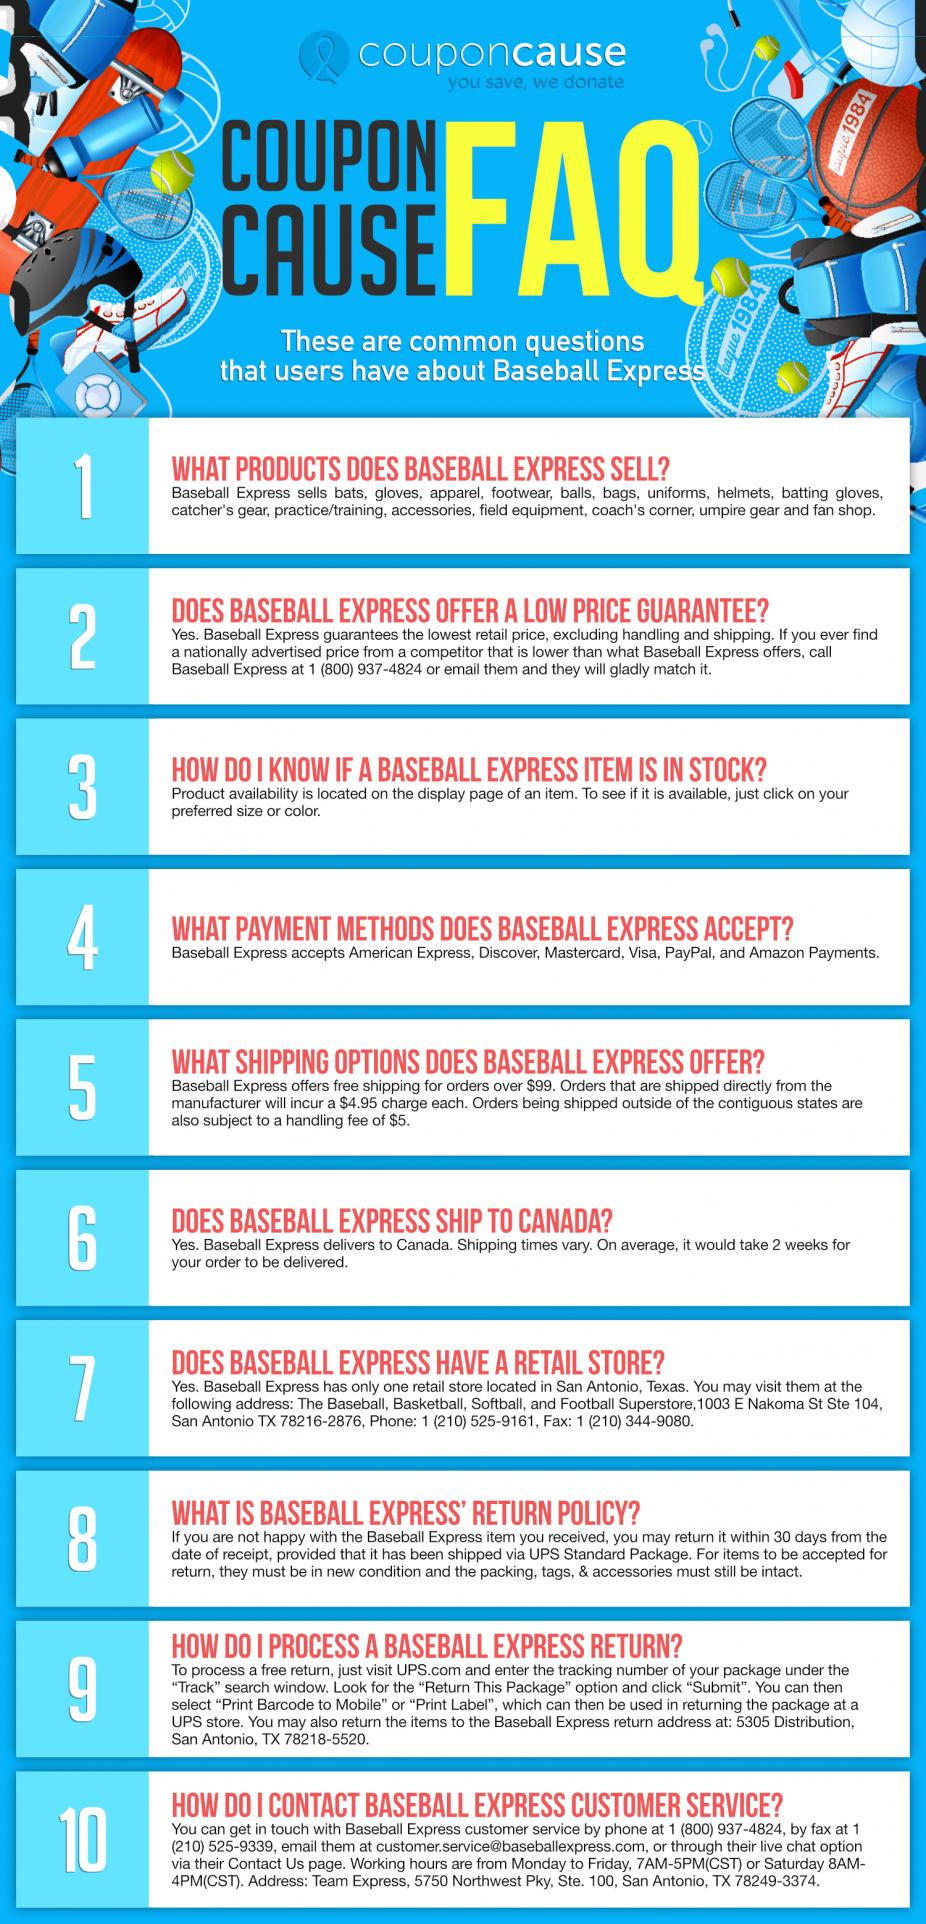 Baseball Express Coupon Cause FAQ (C.C. FAQ)